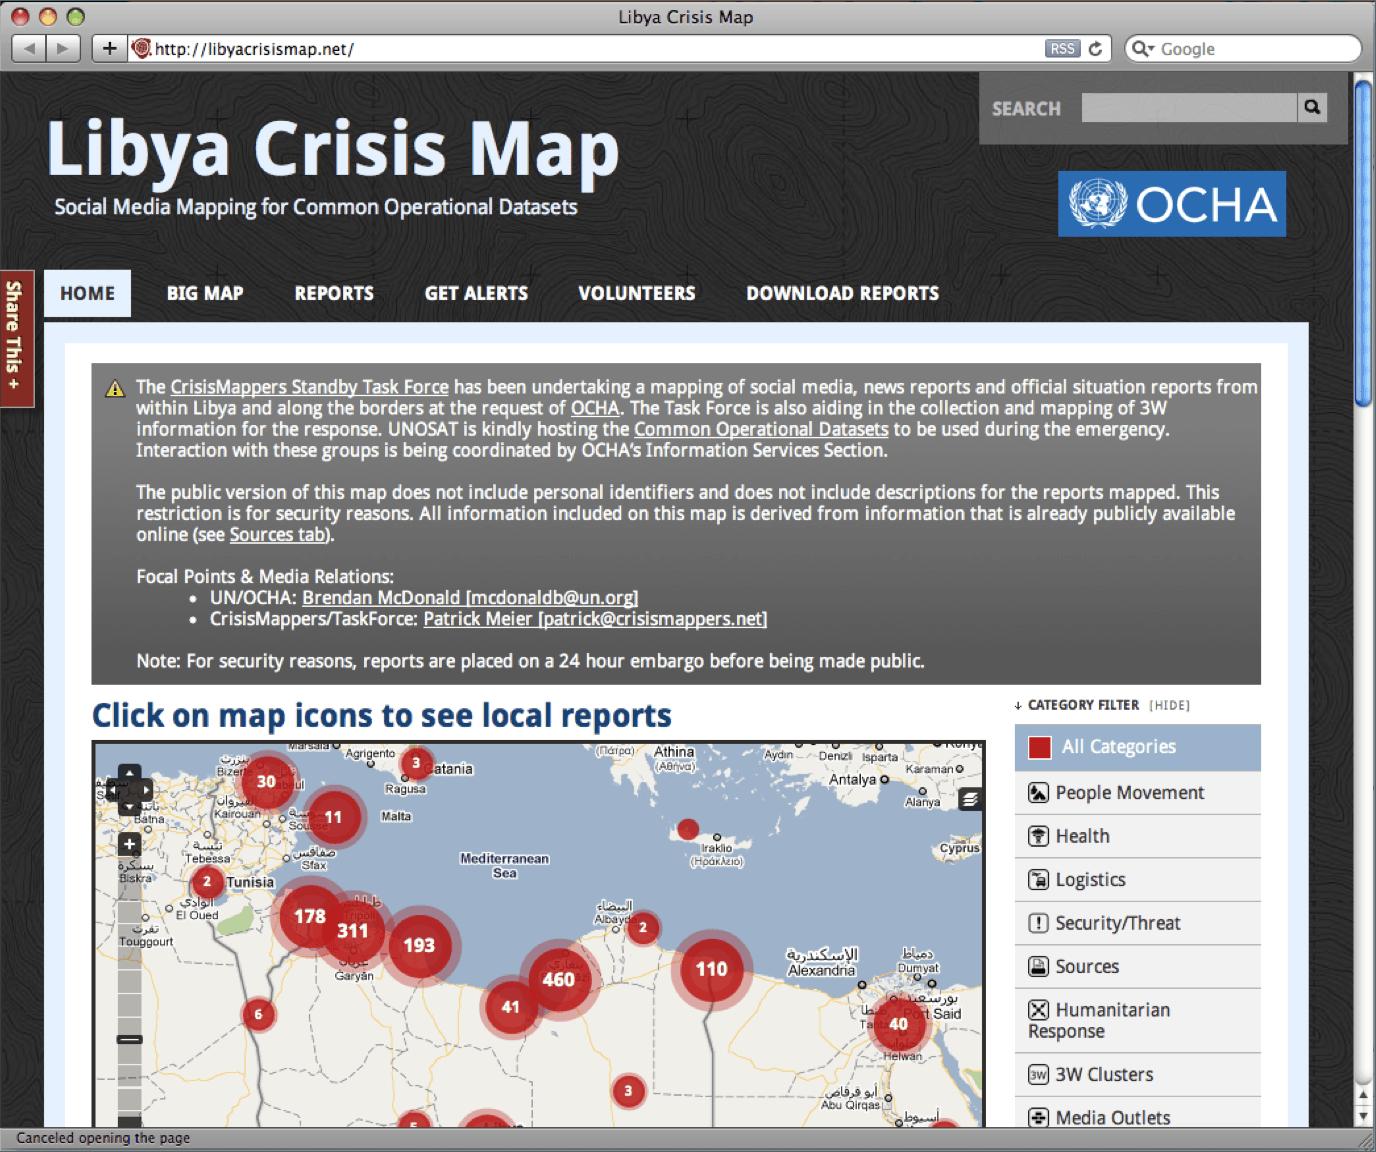 Libya Crisis Map, 2011